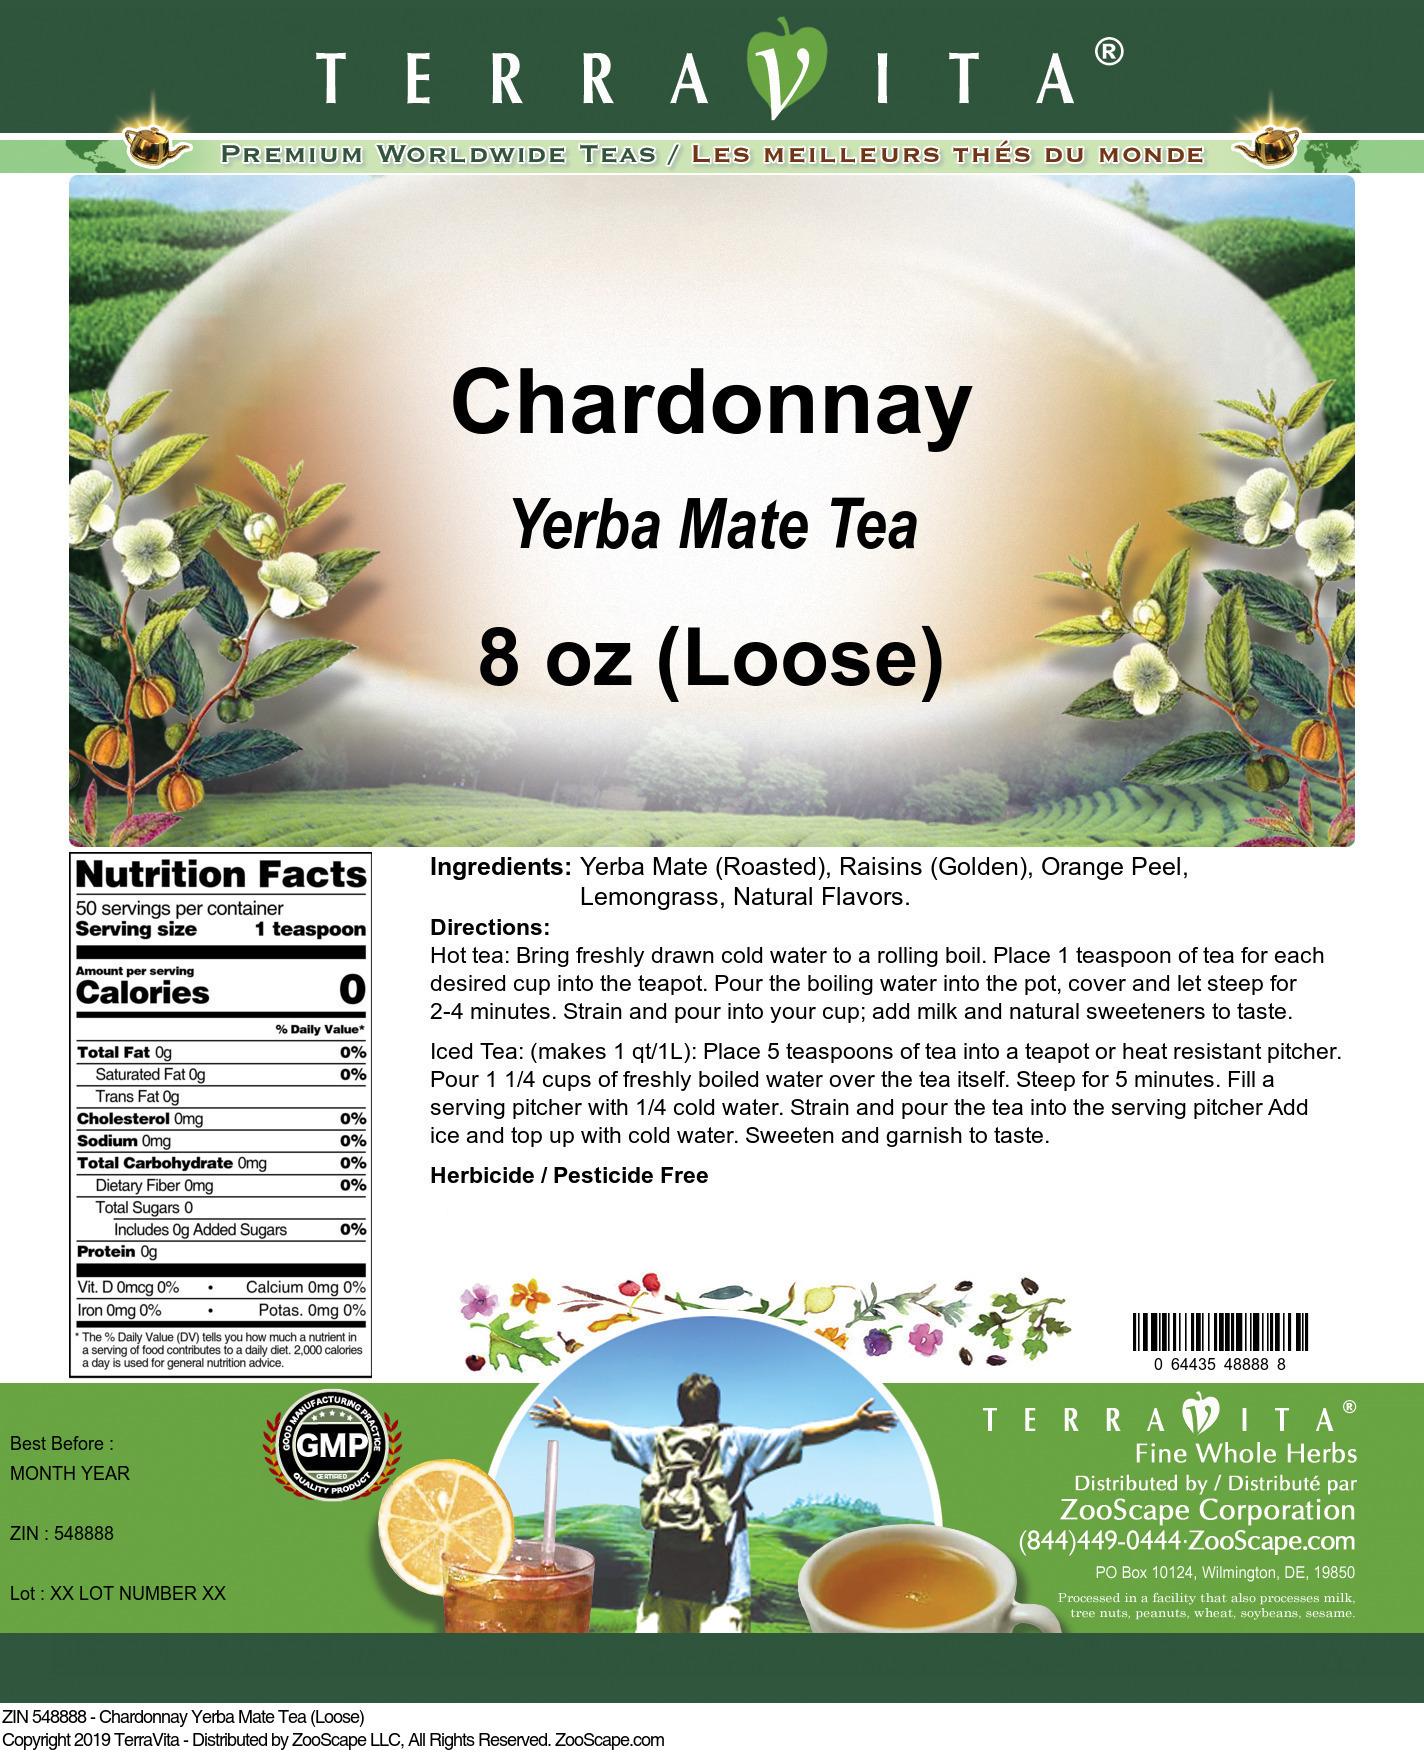 Chardonnay Yerba Mate